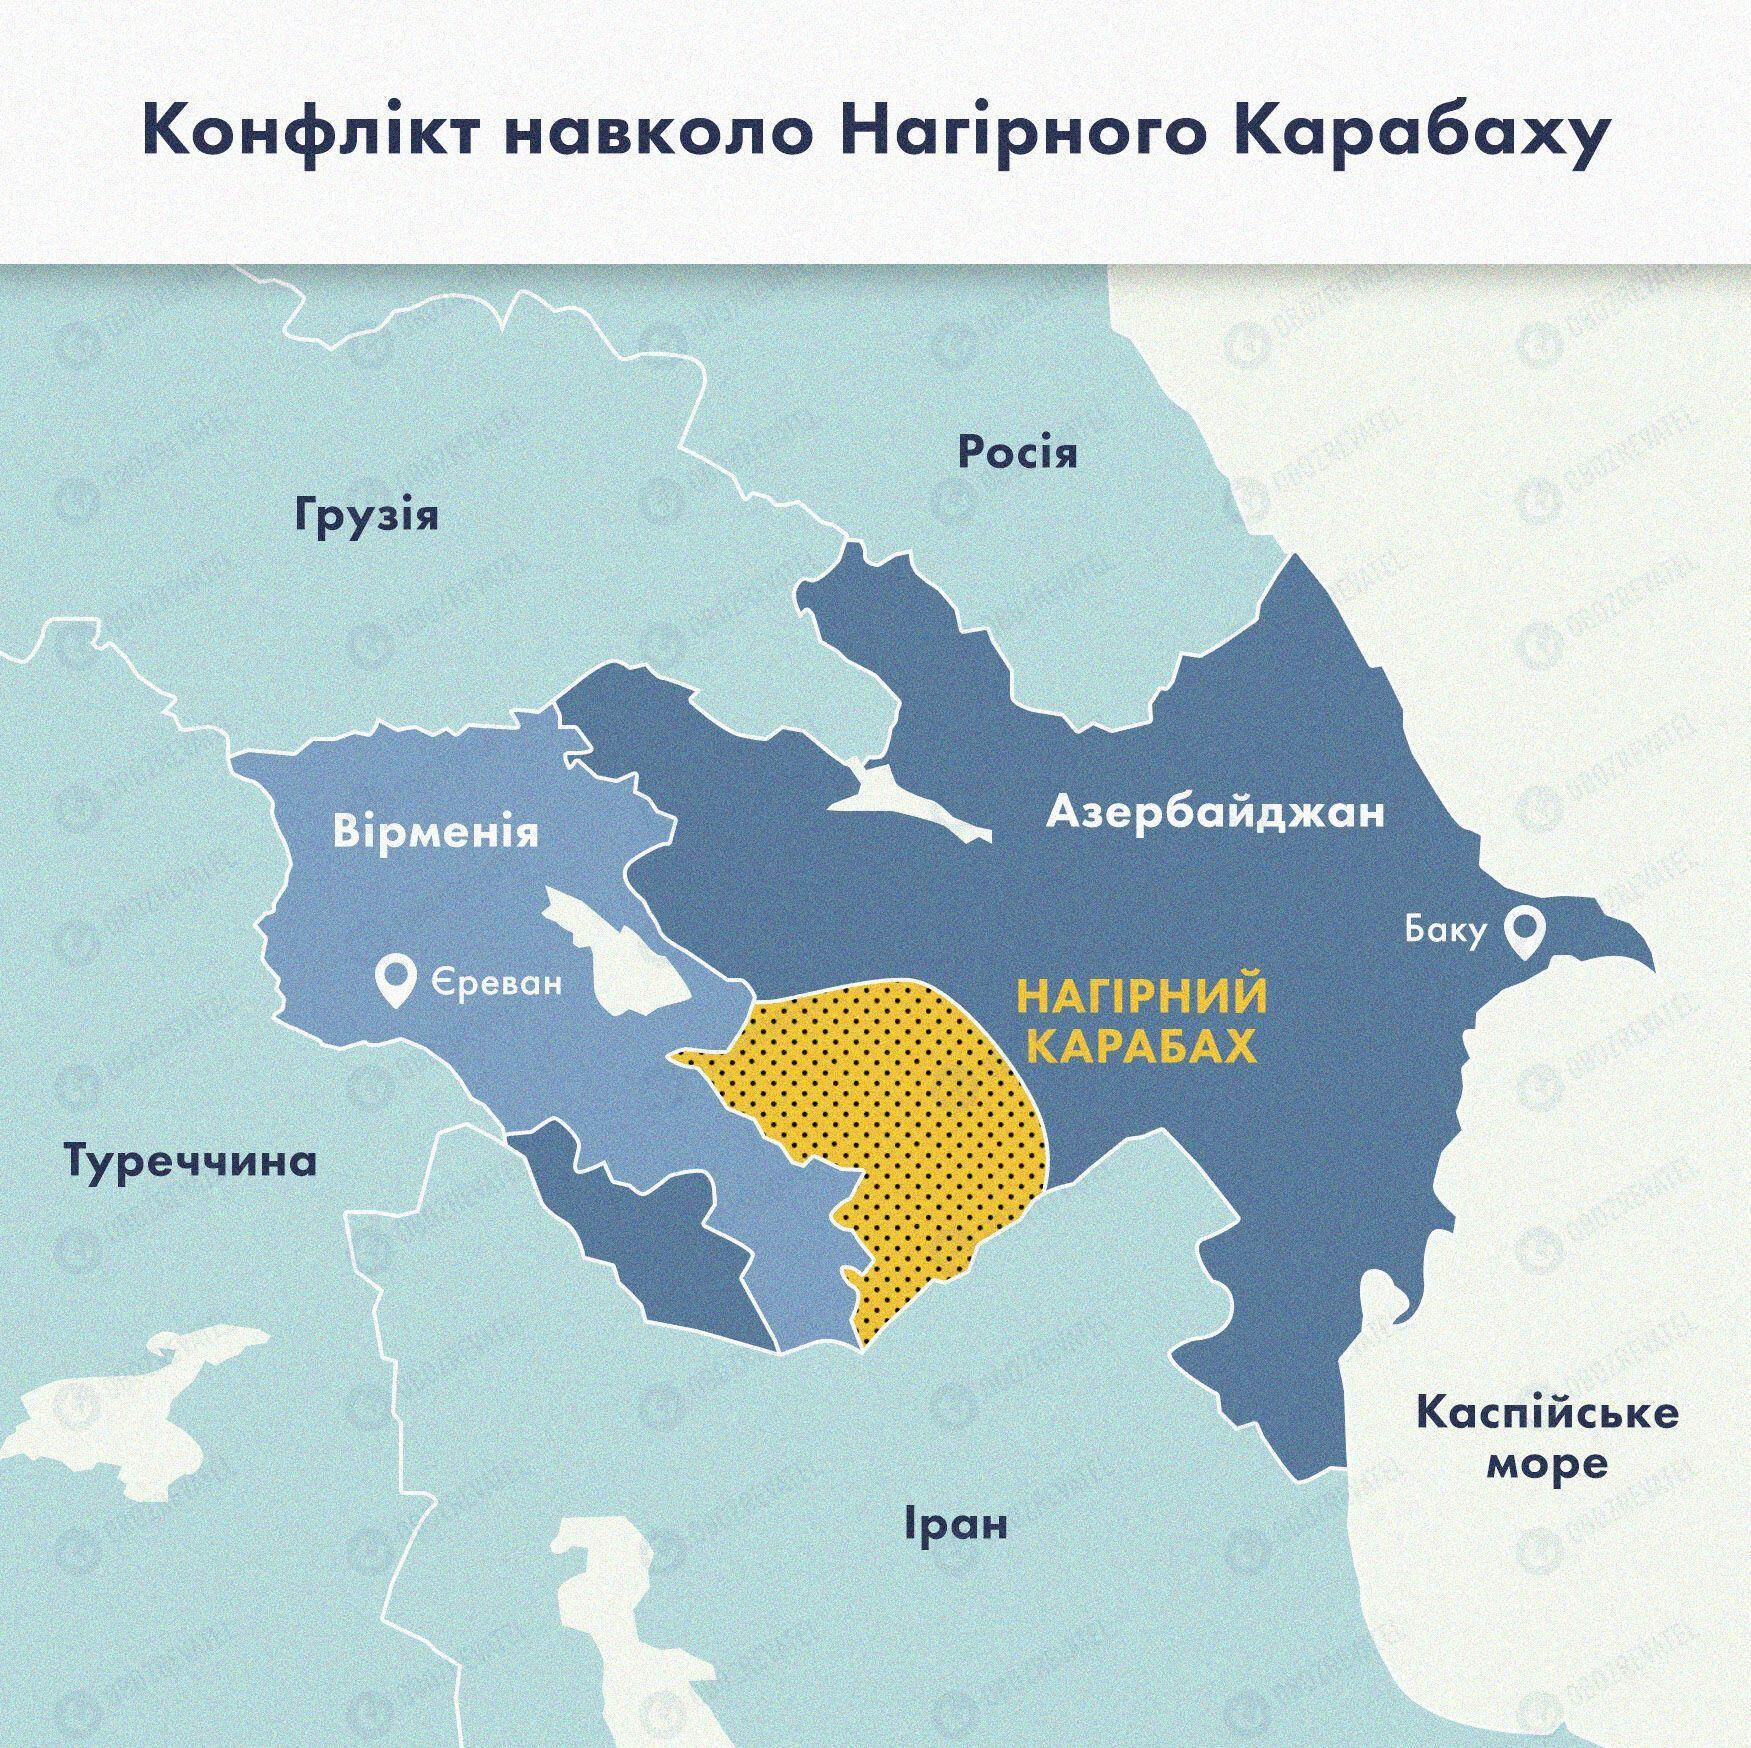 Карта по ситуации вокруг Нагорного Карабаха